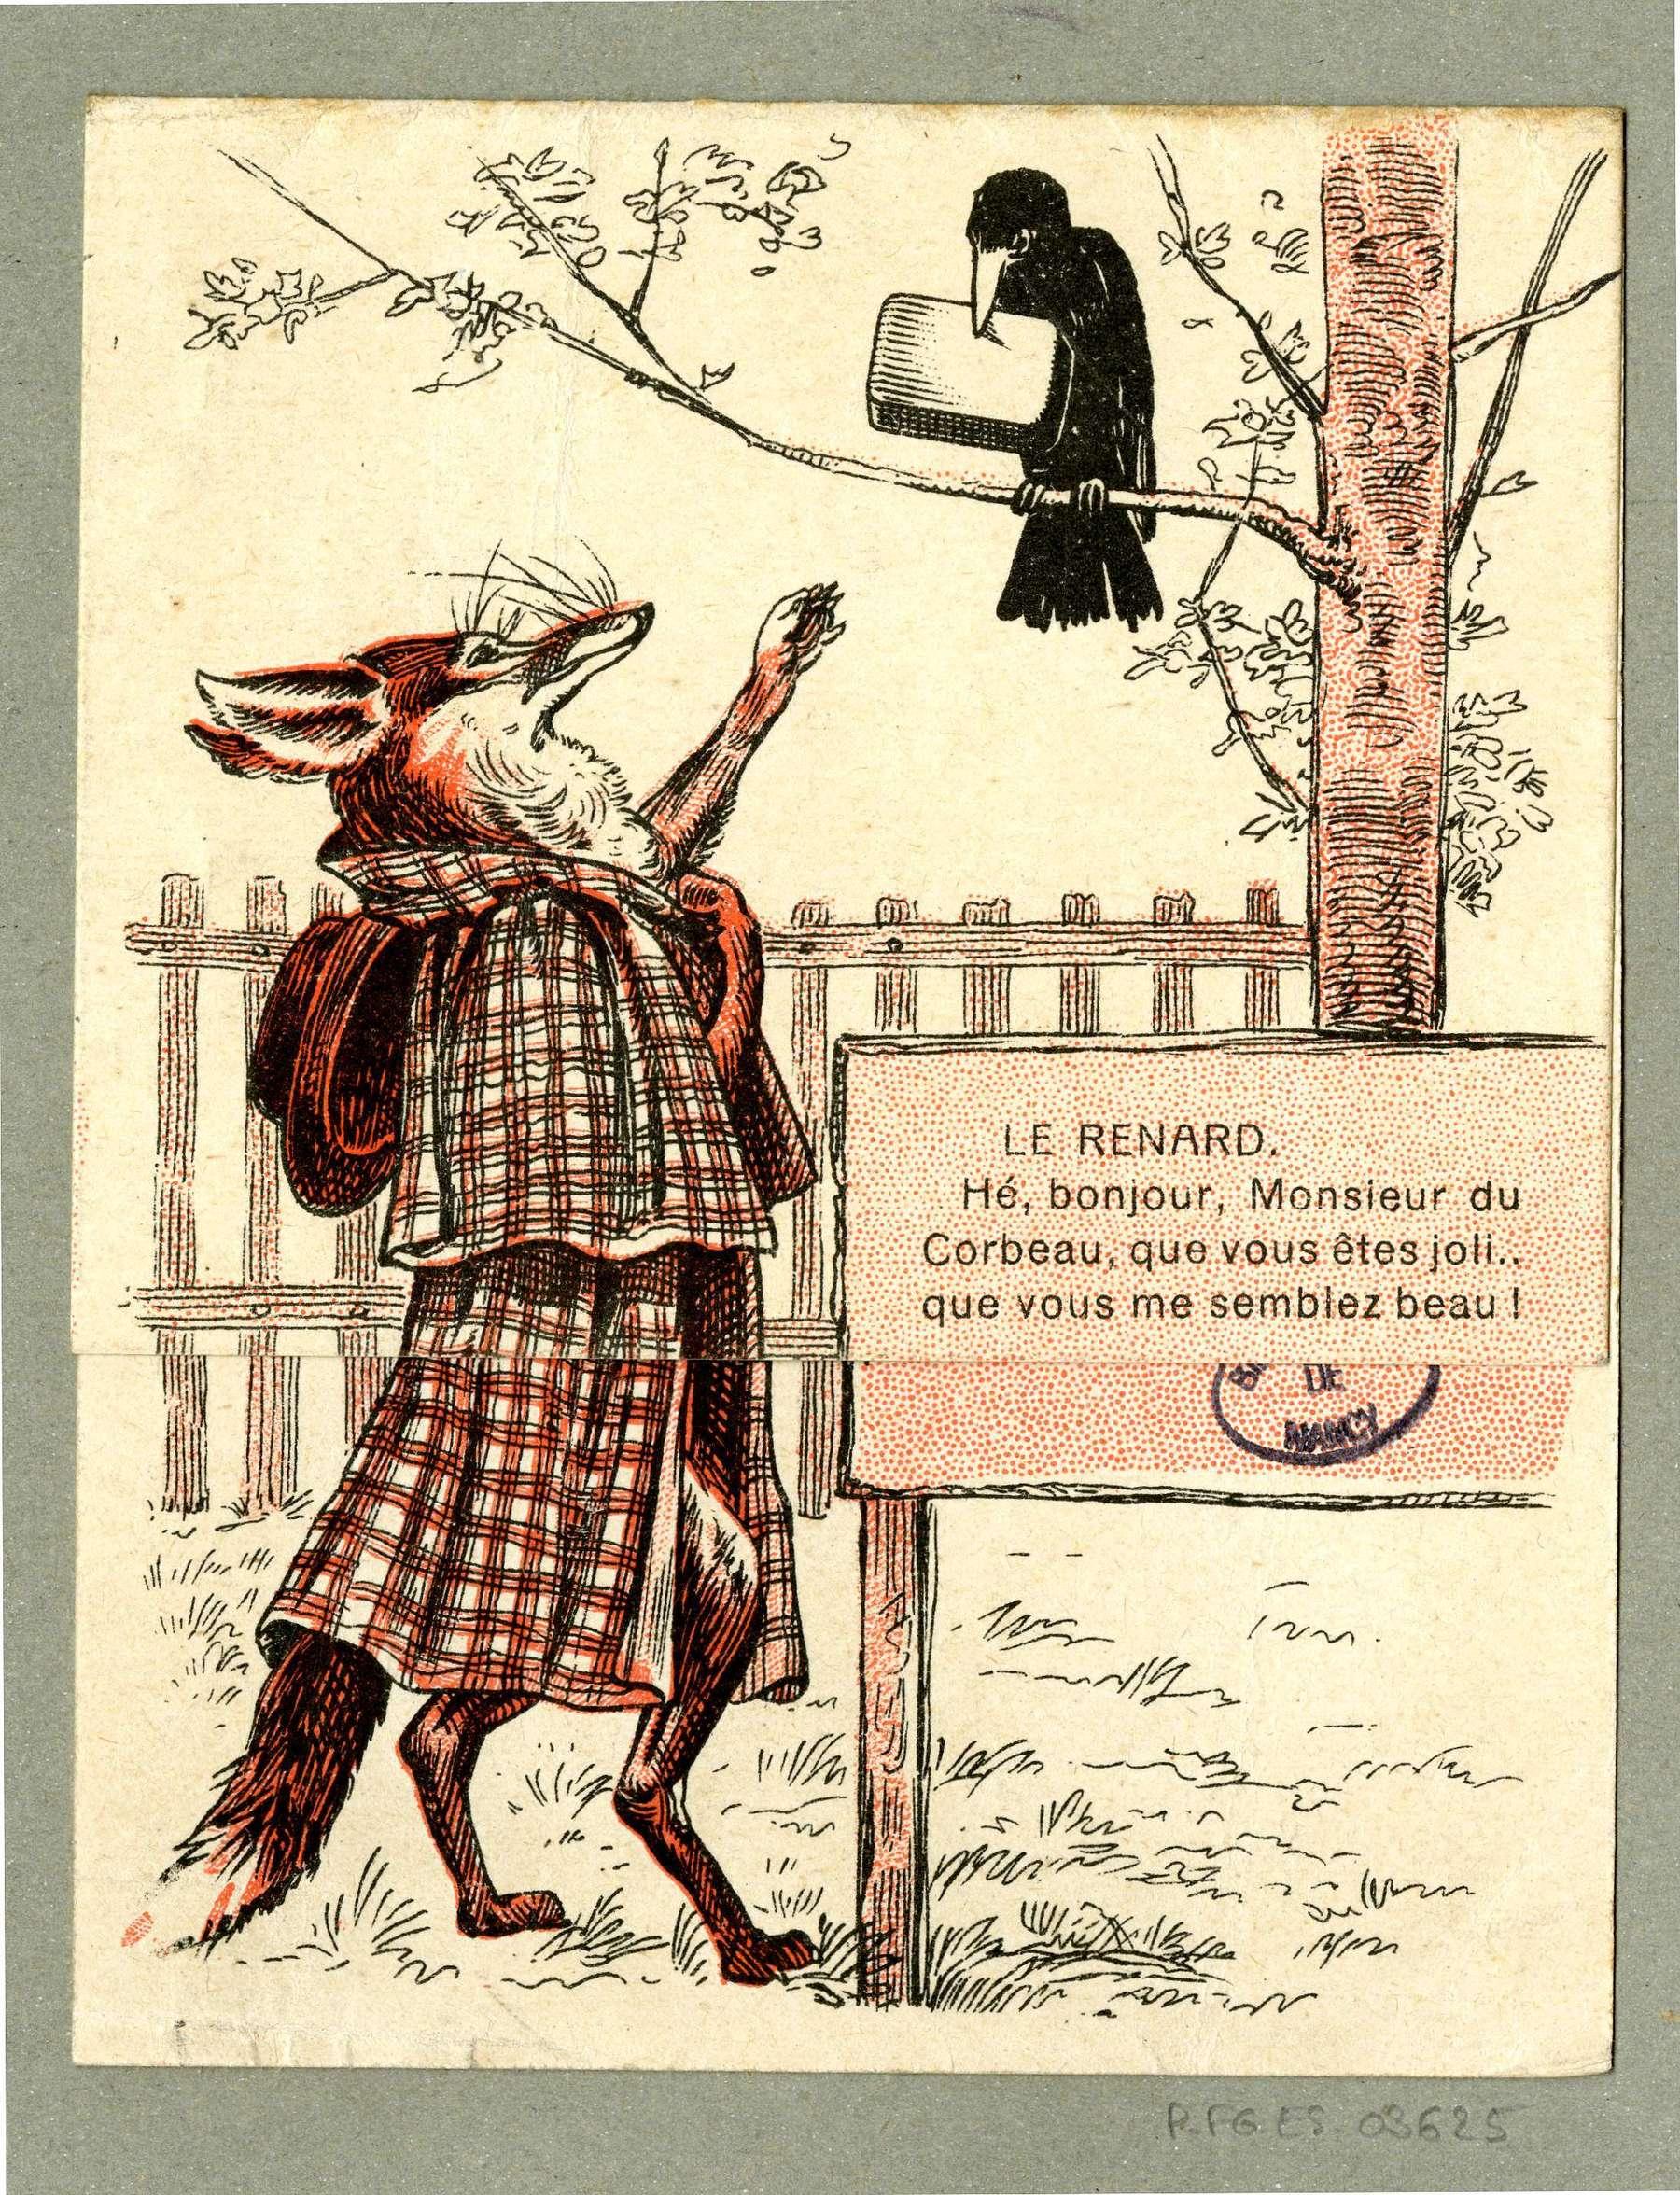 Contenu du Le renard